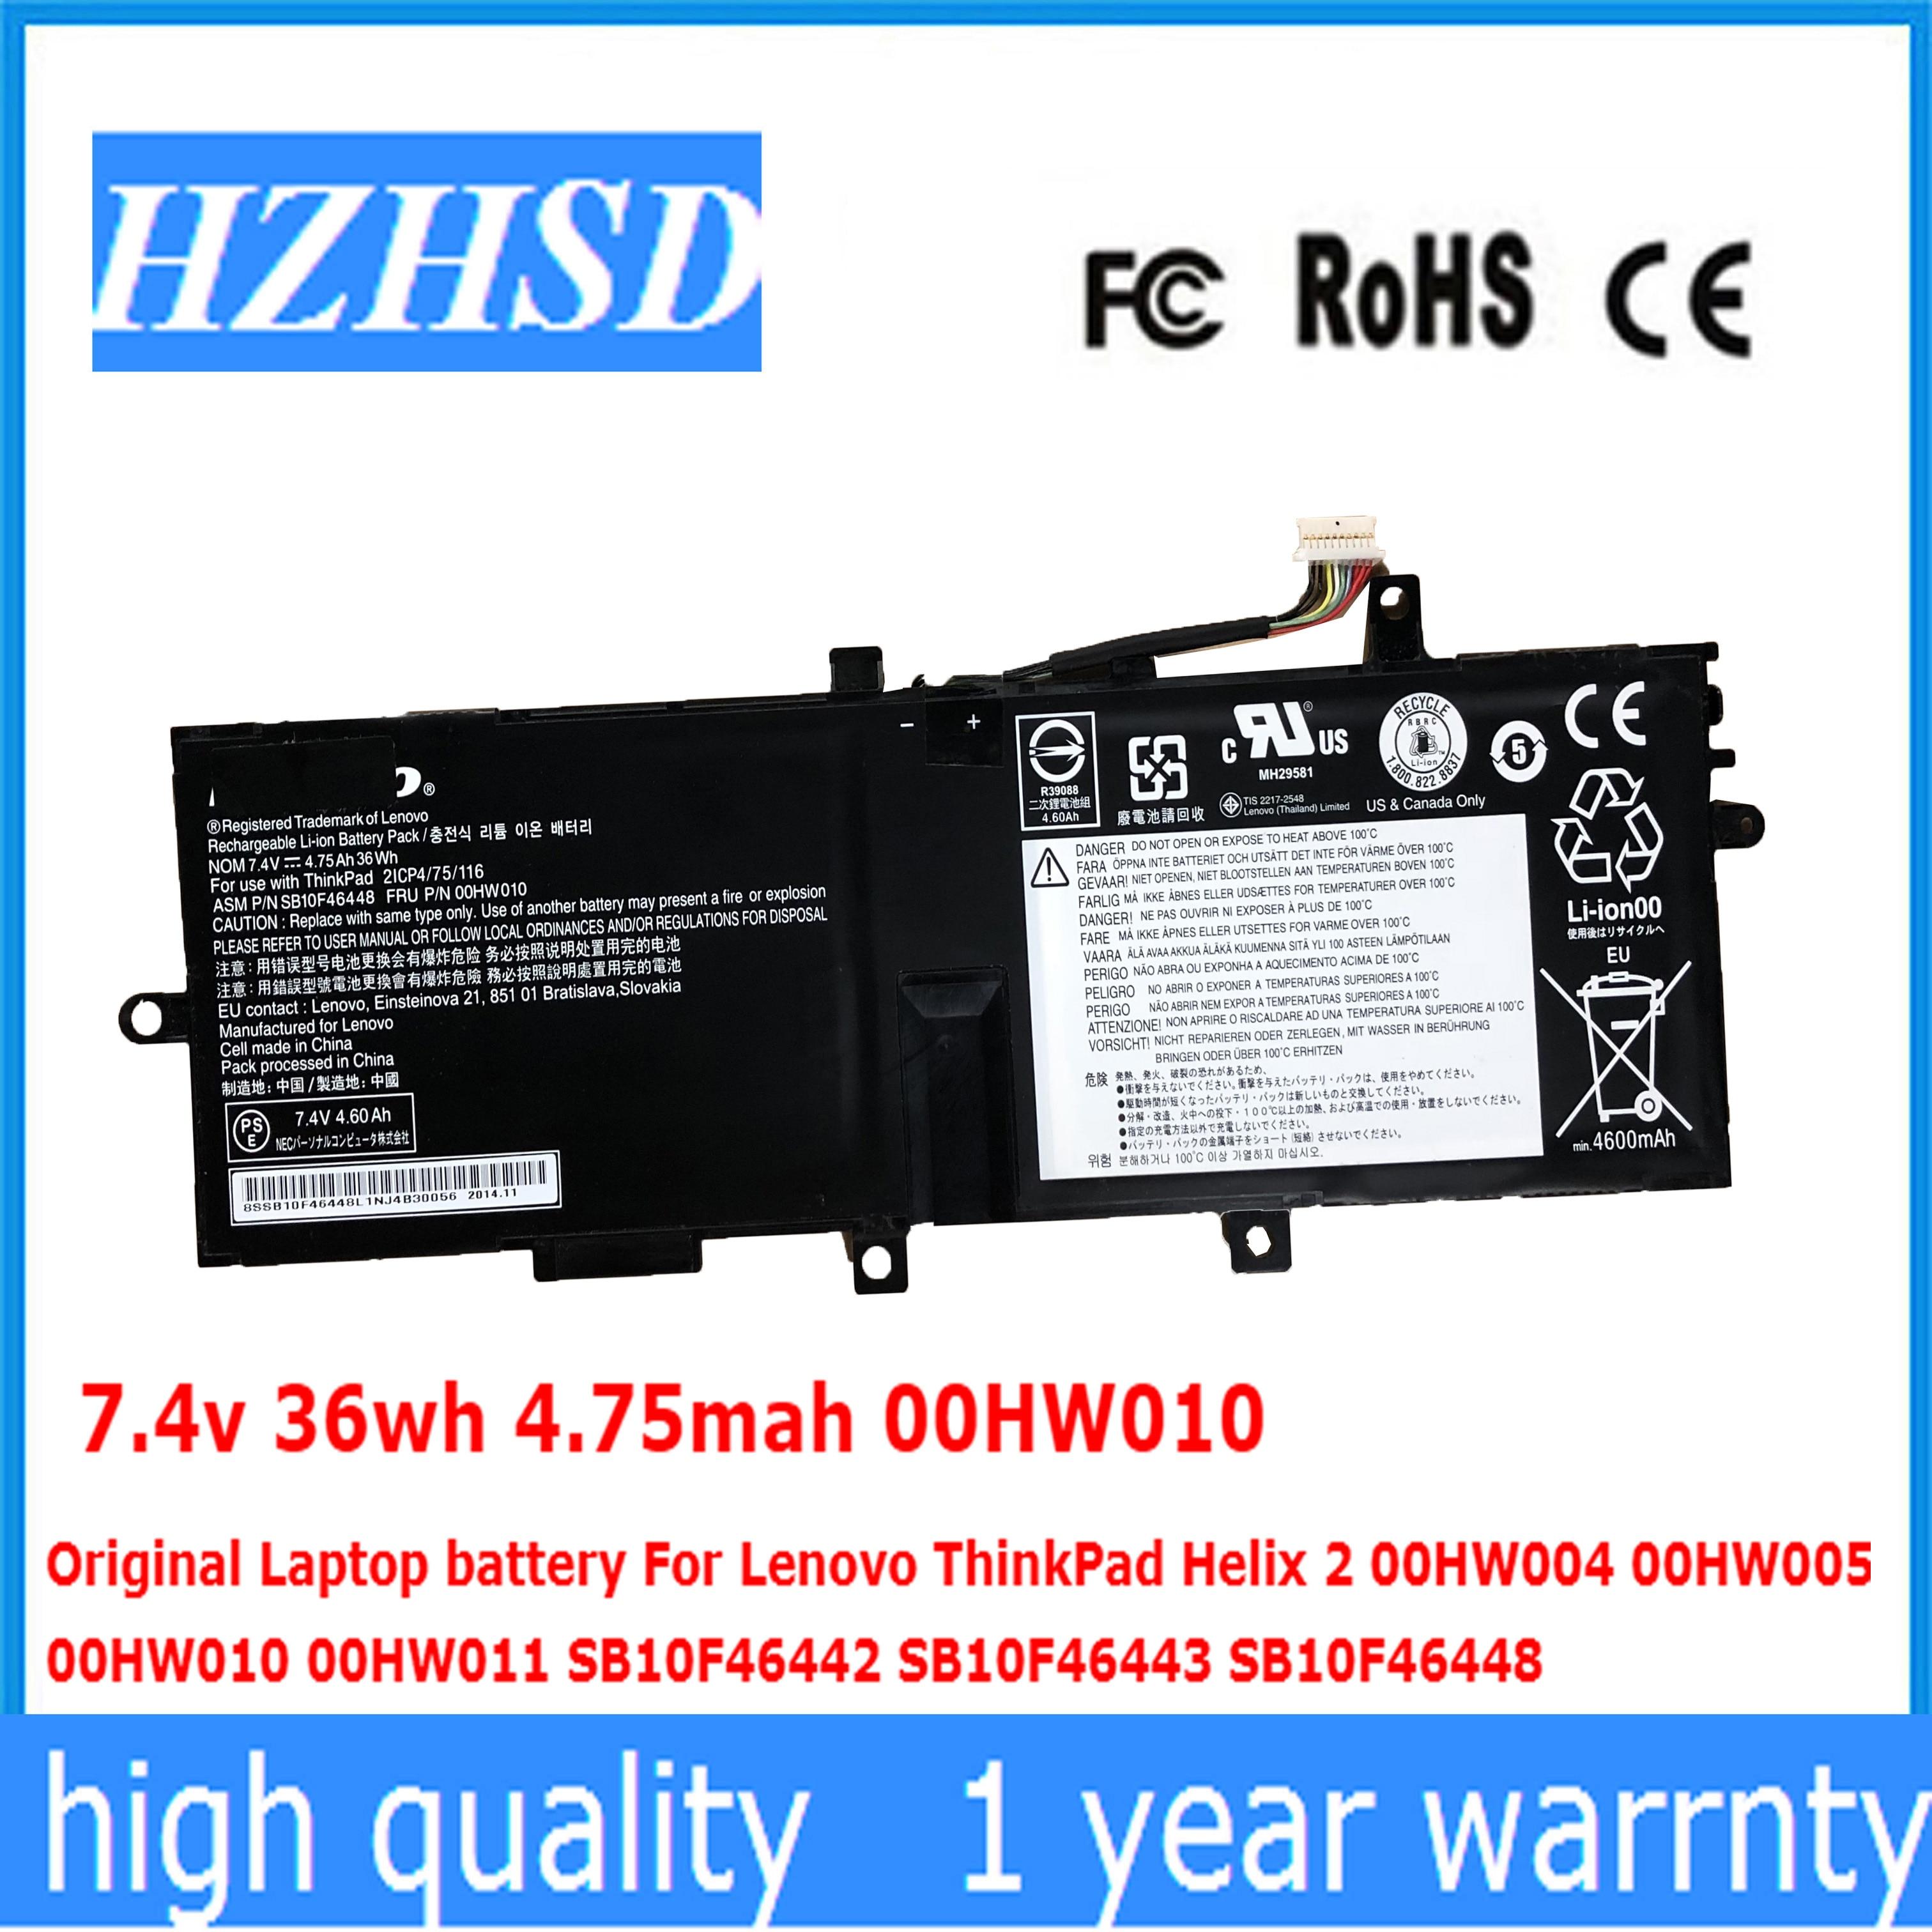 Batería Original para portátil 7,4 v 36wh 4,75 mah 00HW010 para Lenovo ThinkPad Helix 2 00HW004 00HW005 00HW010 00HW011 SB10F46442 448 443